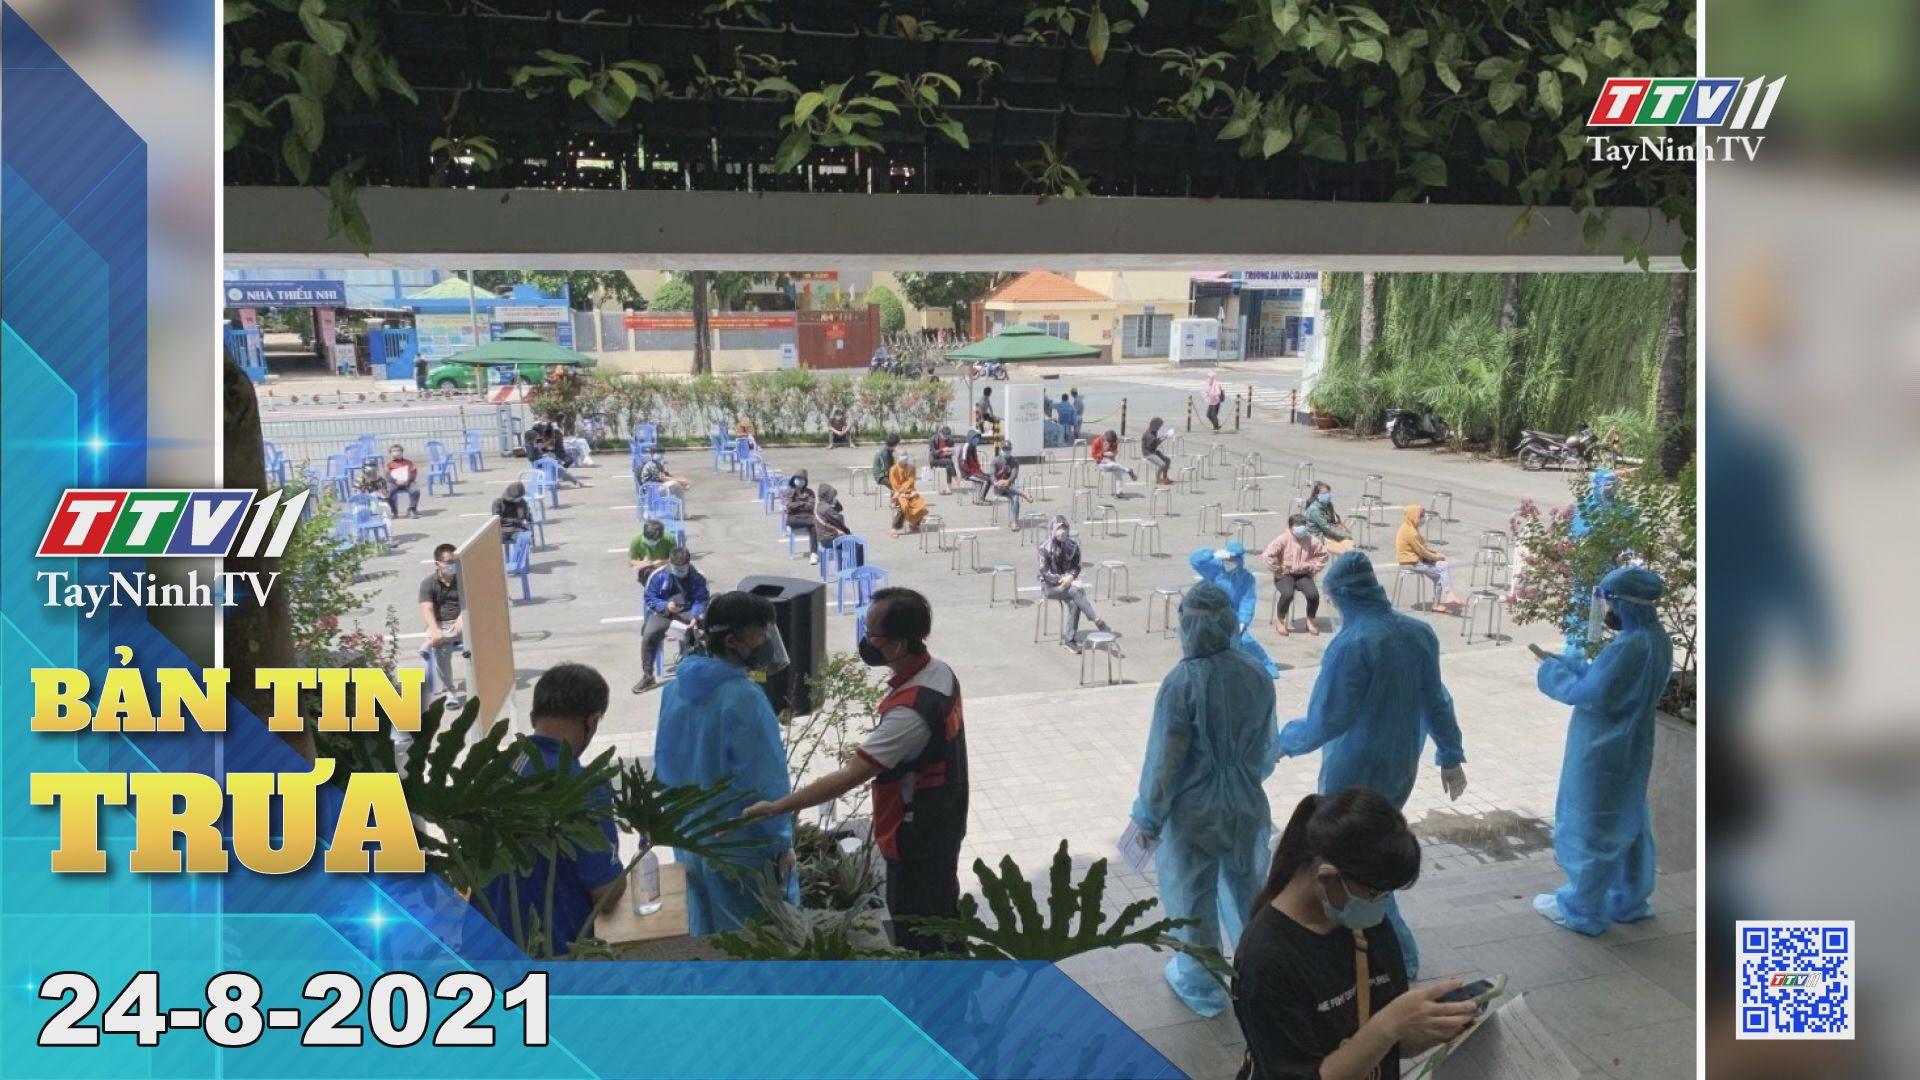 Bản tin trưa 24-8-2021 | Tin tức hôm nay | TayNinhTV